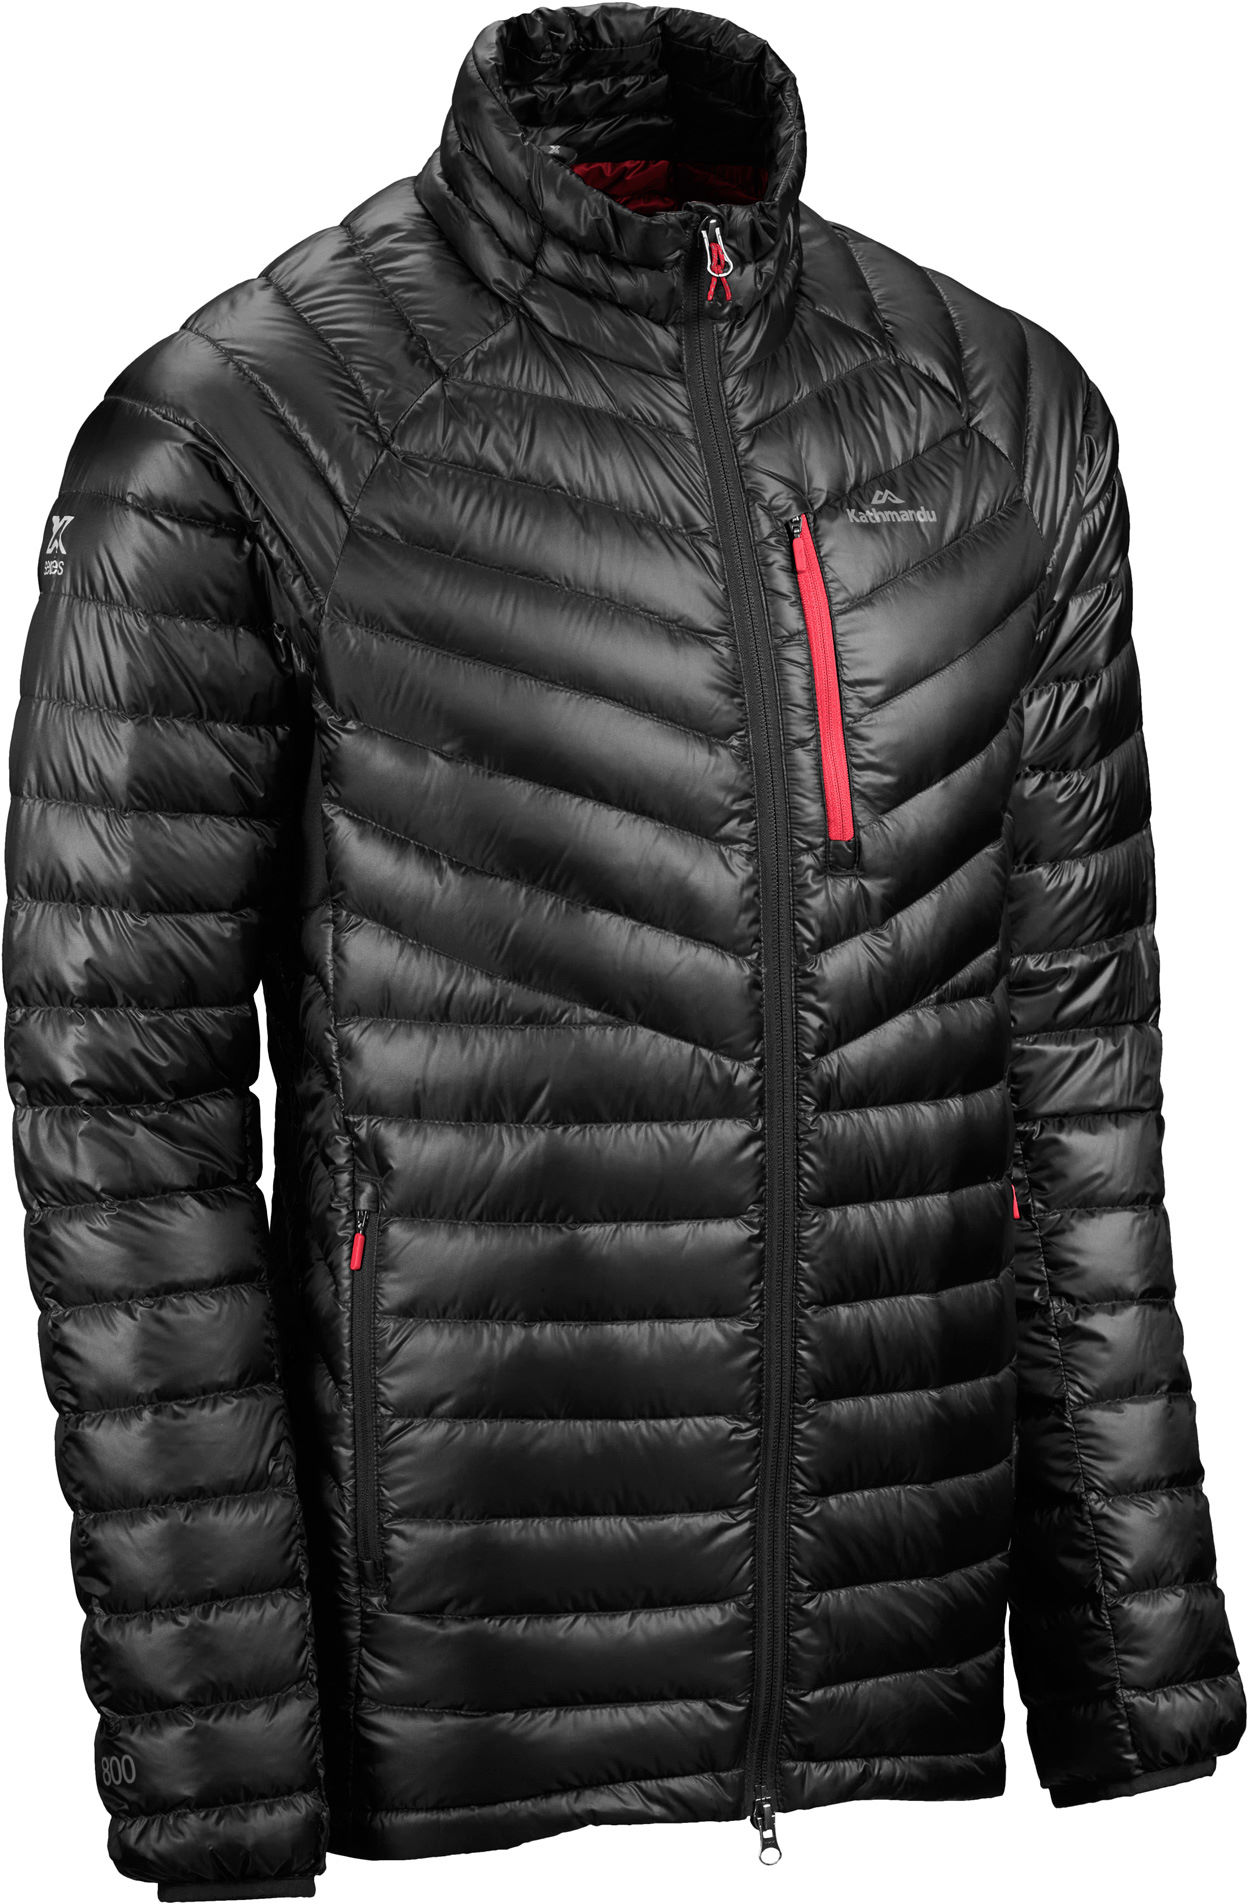 down jackets kathmandu ultralight down jacket v2 BJALBCH